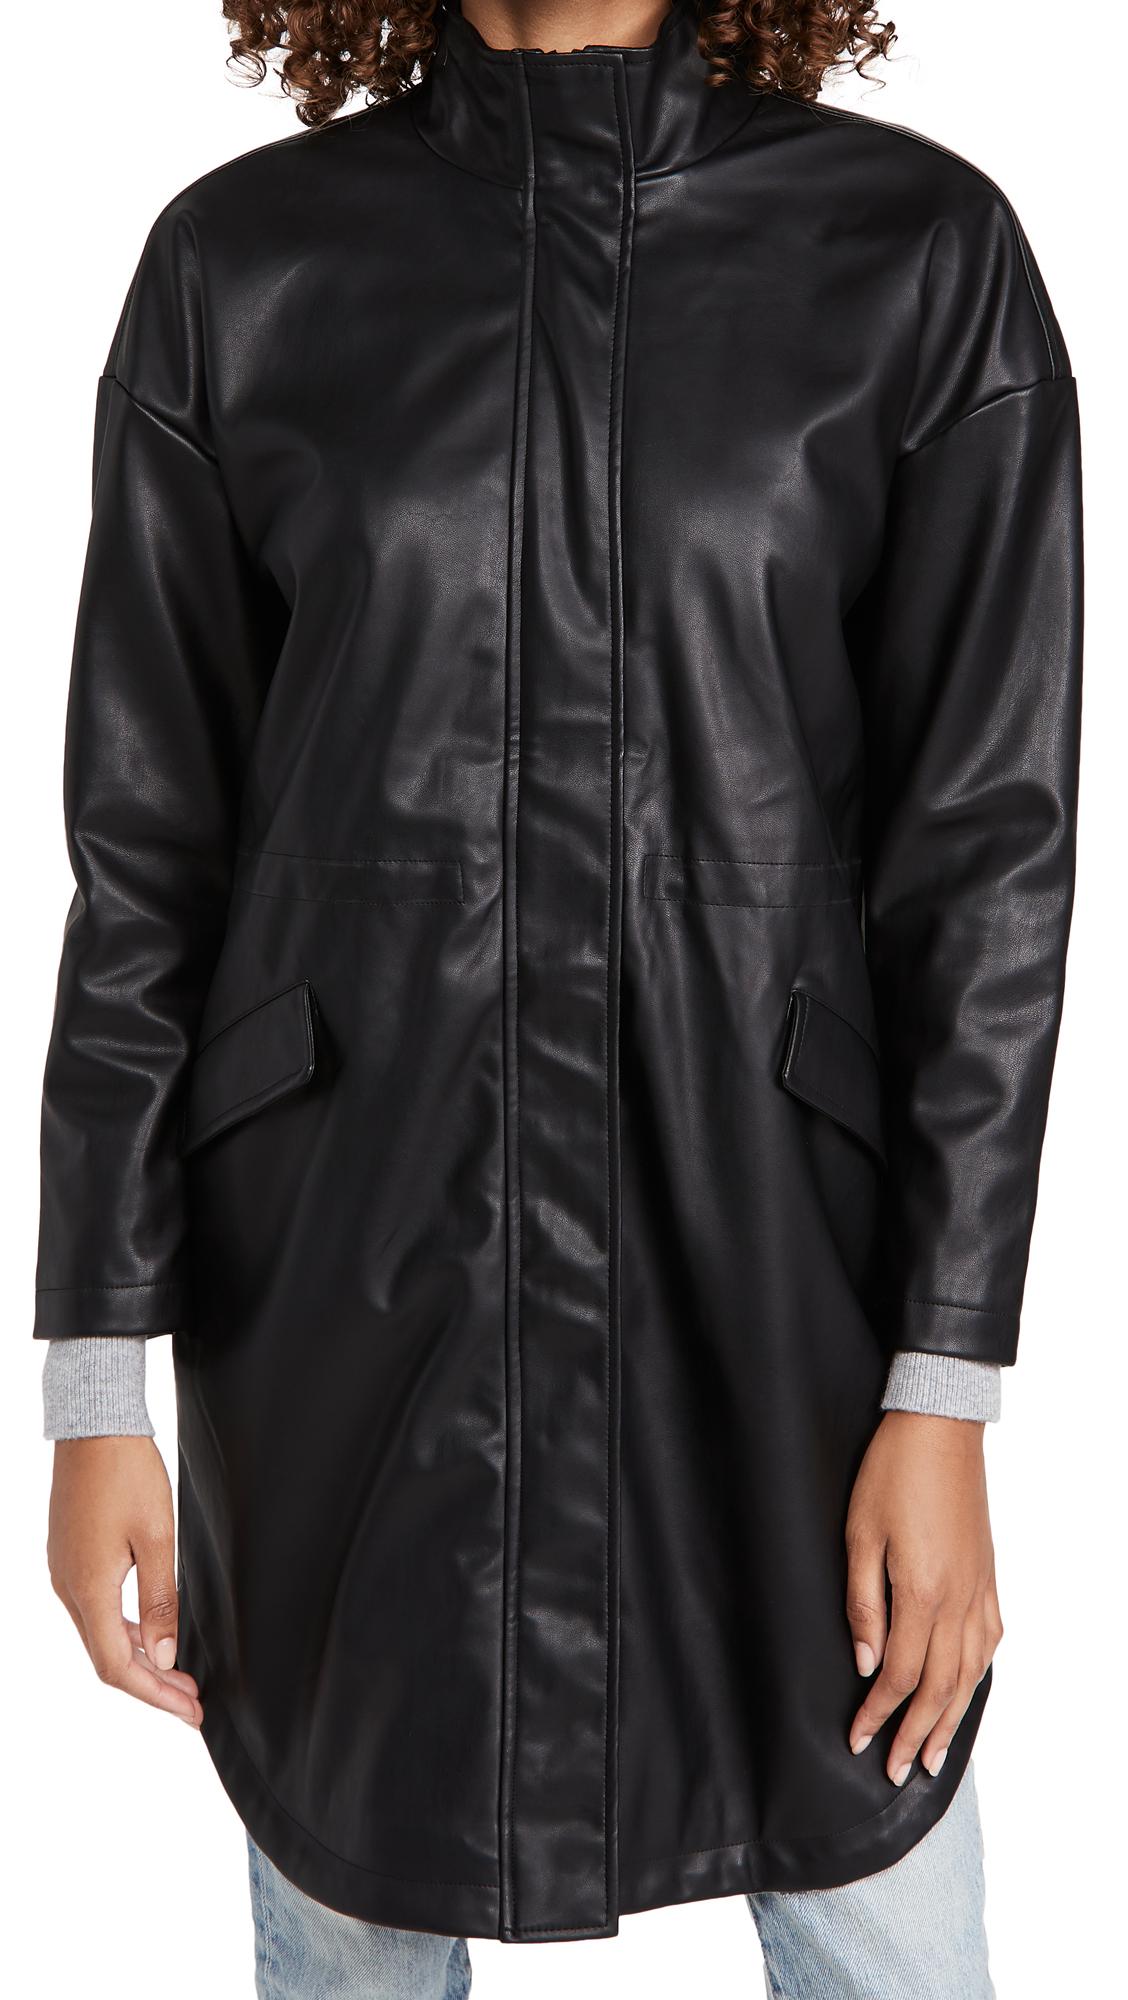 BB Dakota No Mo' Faux-Mo Vegan Leather Jacket